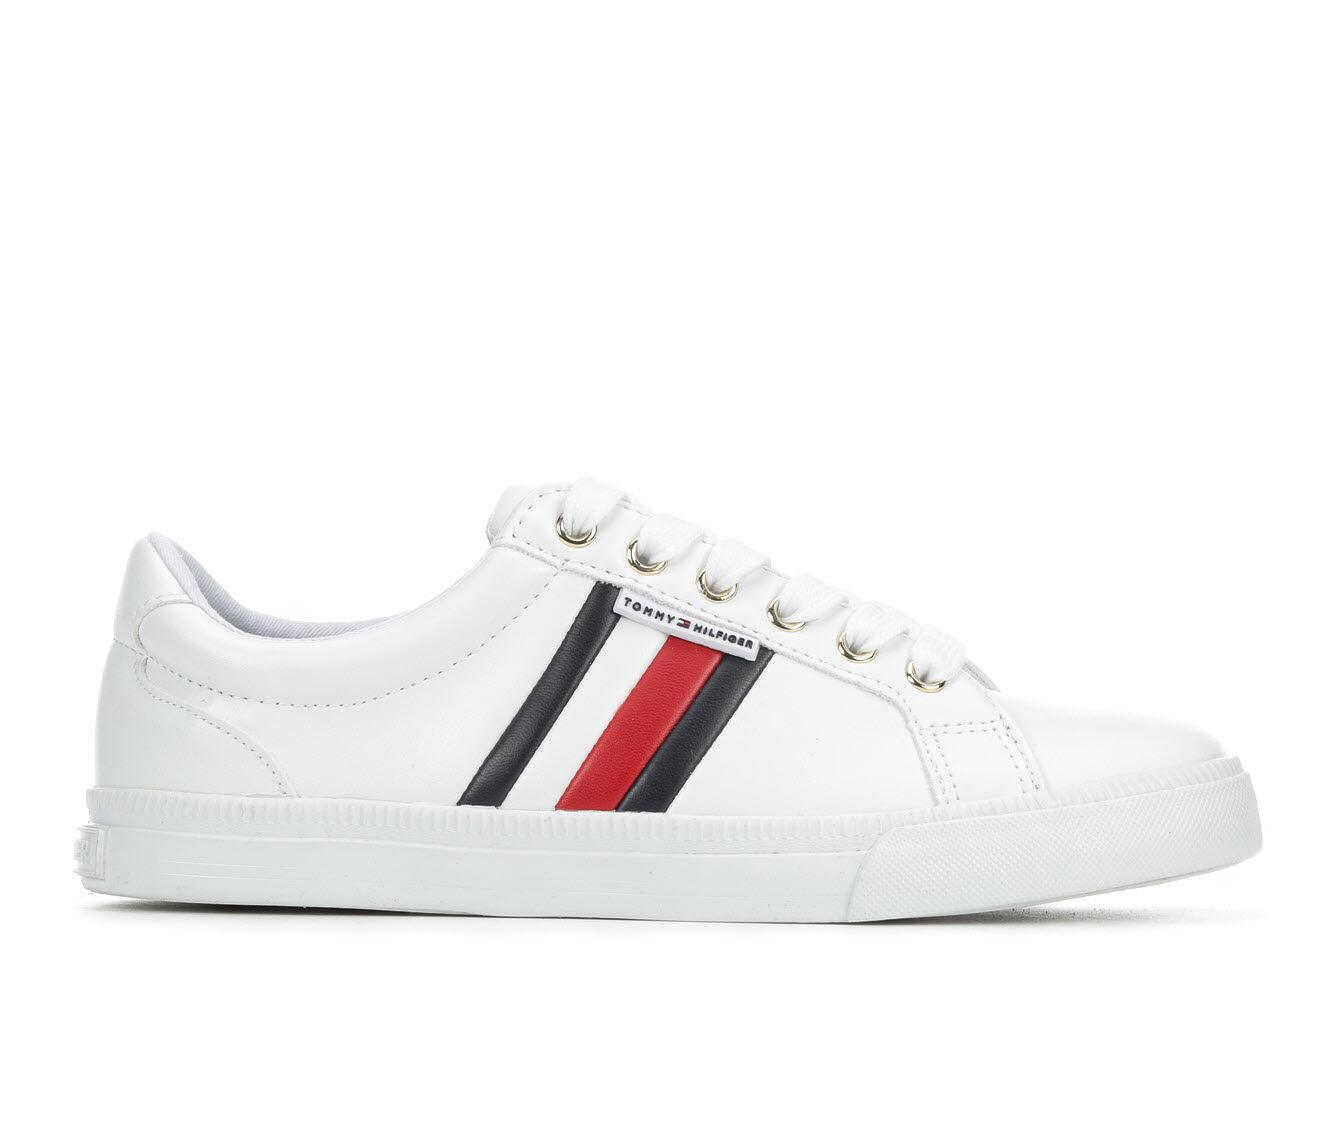 Women's Tommy Hilfiger Lightz Sneakers White/Multi